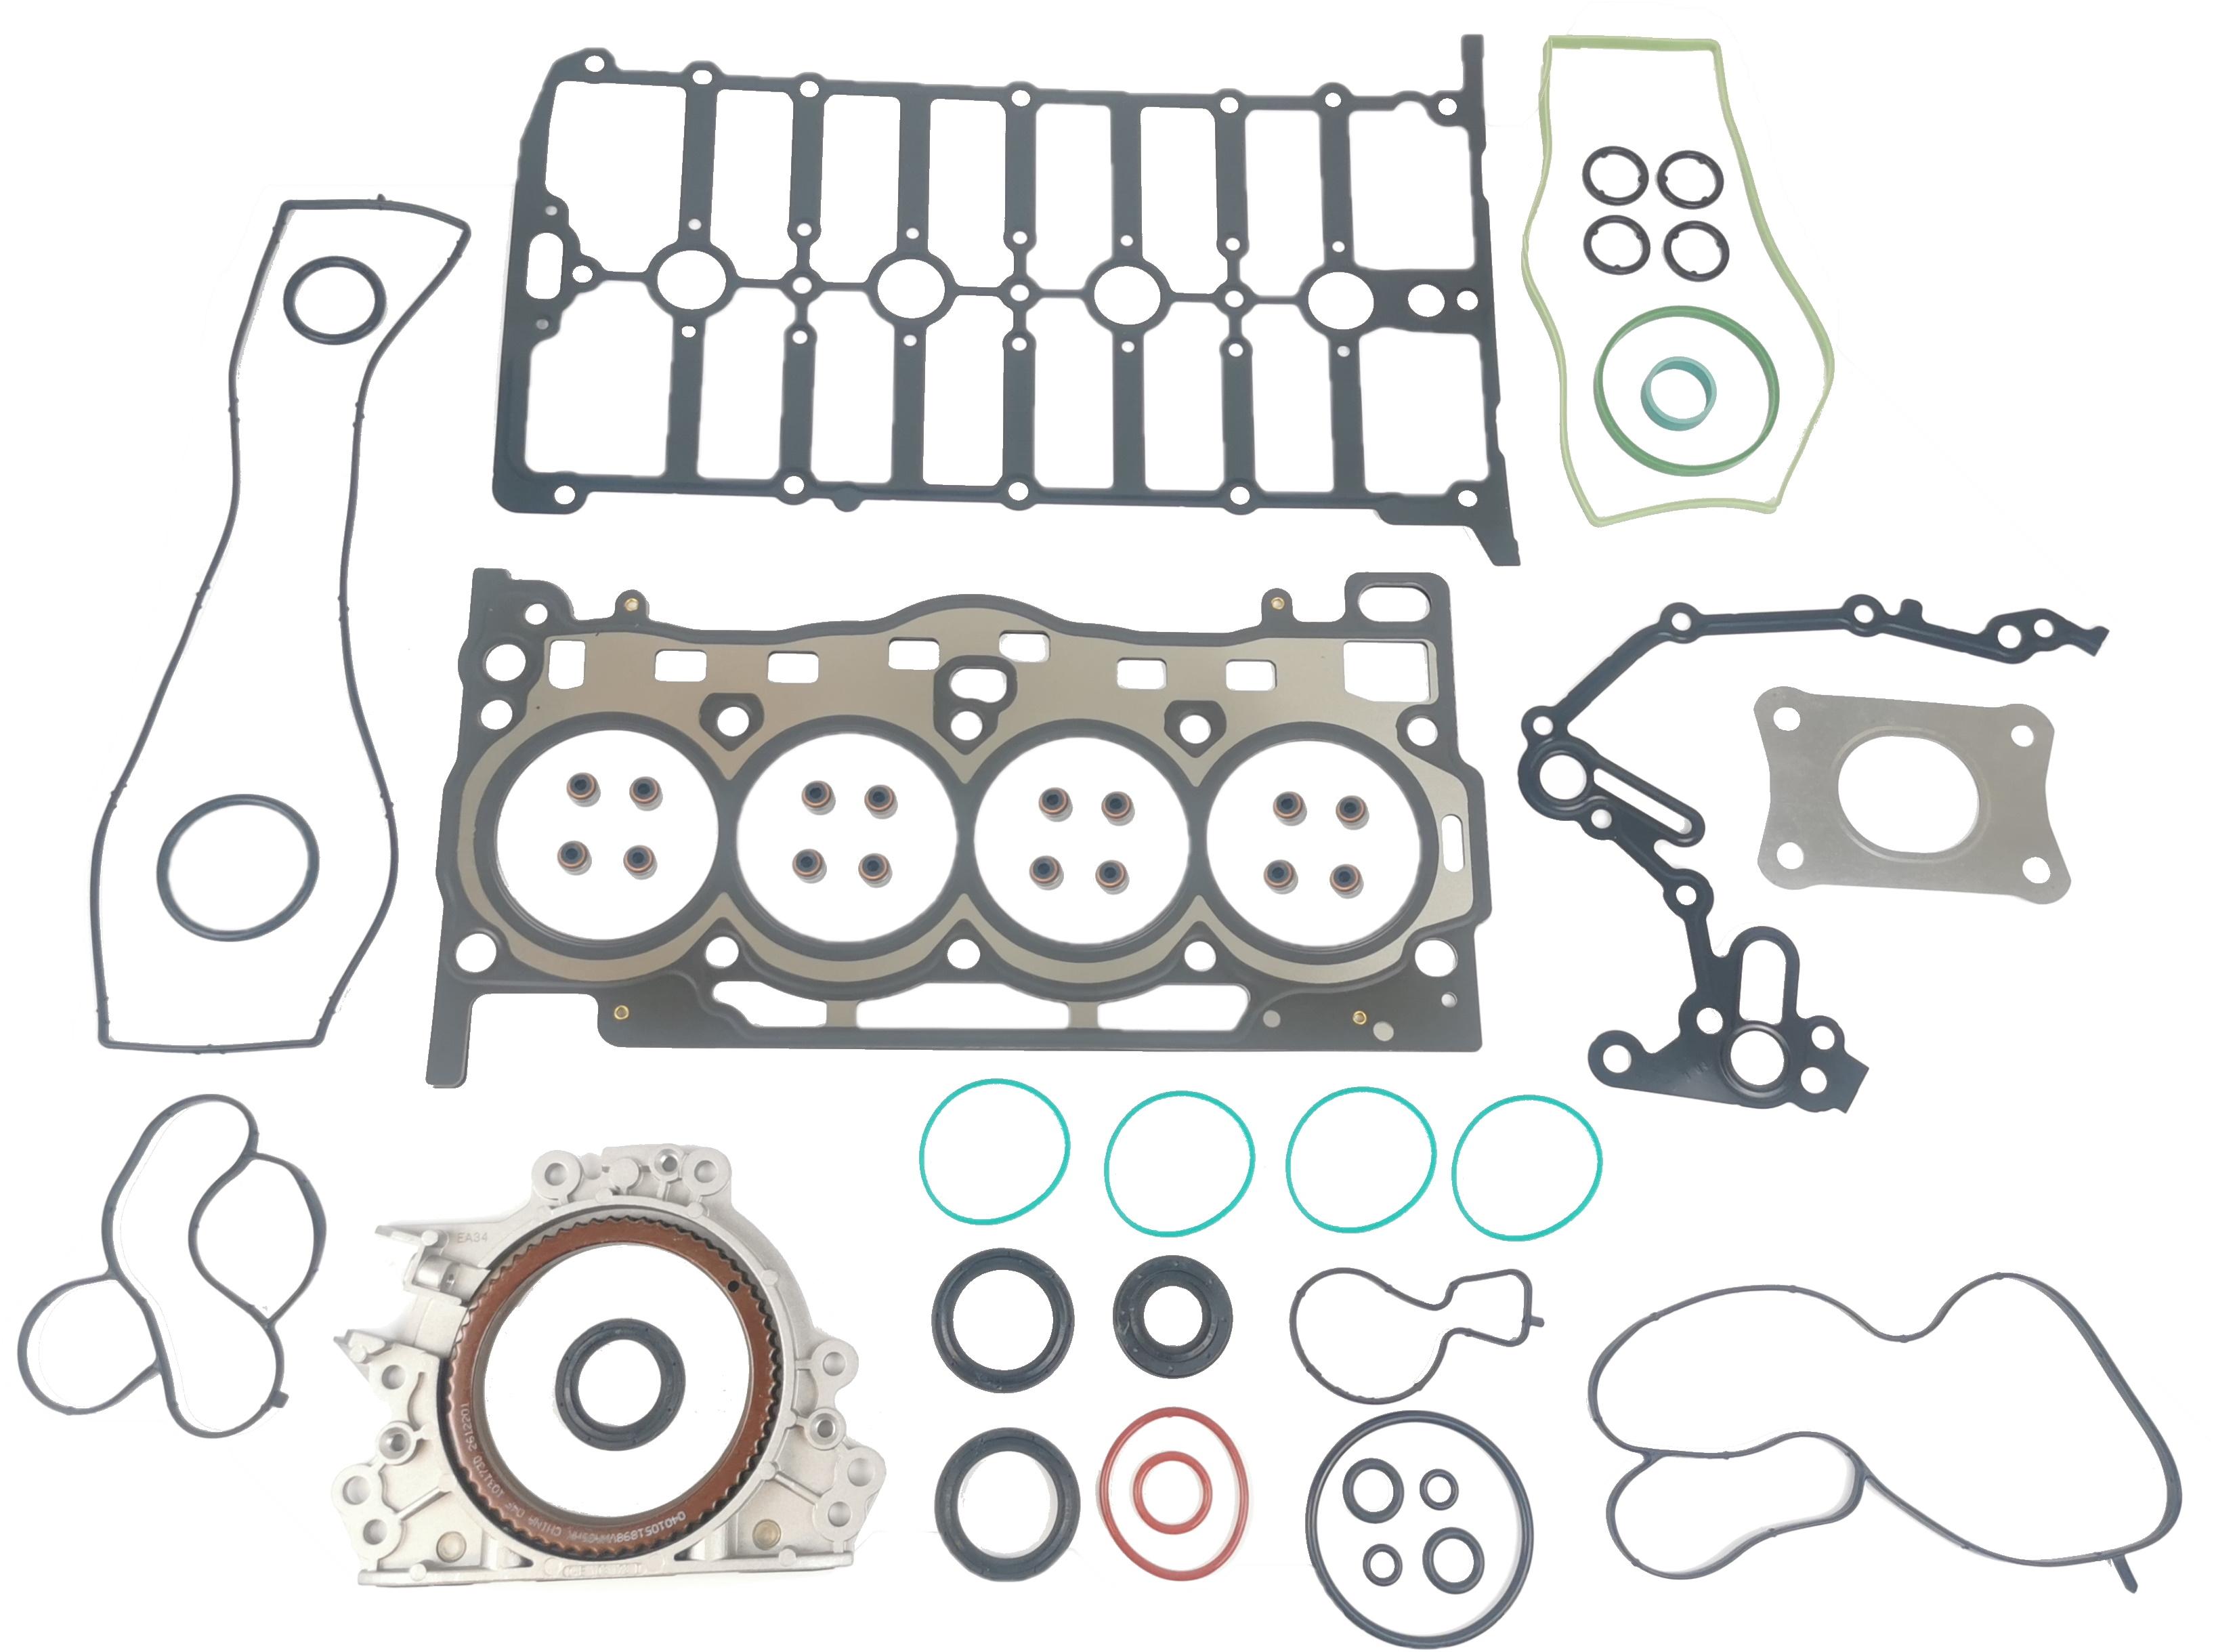 Zylinderkopfdichtung Dichtungssatz für Audi Seat Skoda VW 1,4 TSI TFSI CXS NEU